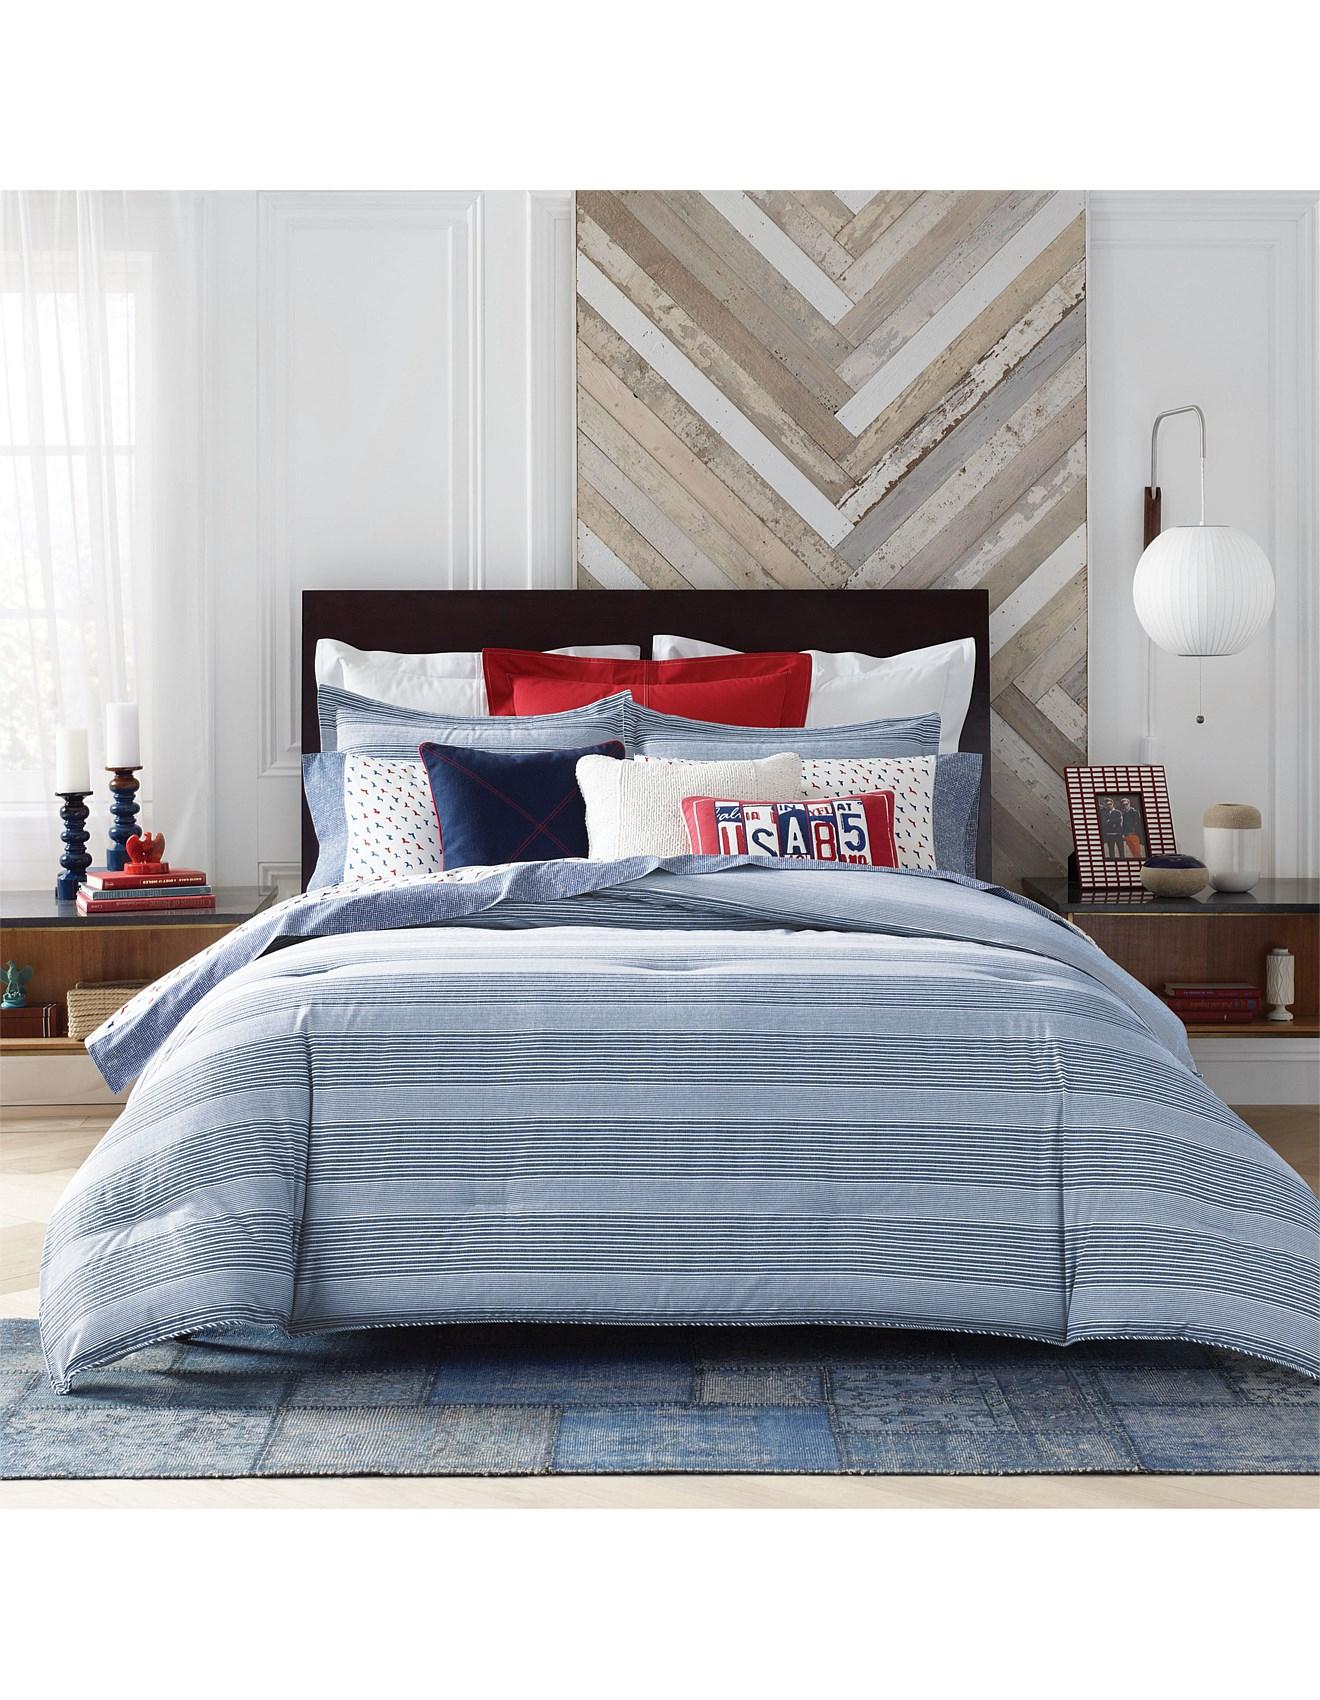 William Stripe Quilt Cover Set Single Bed 1 Zoom Tommy Hilfiger